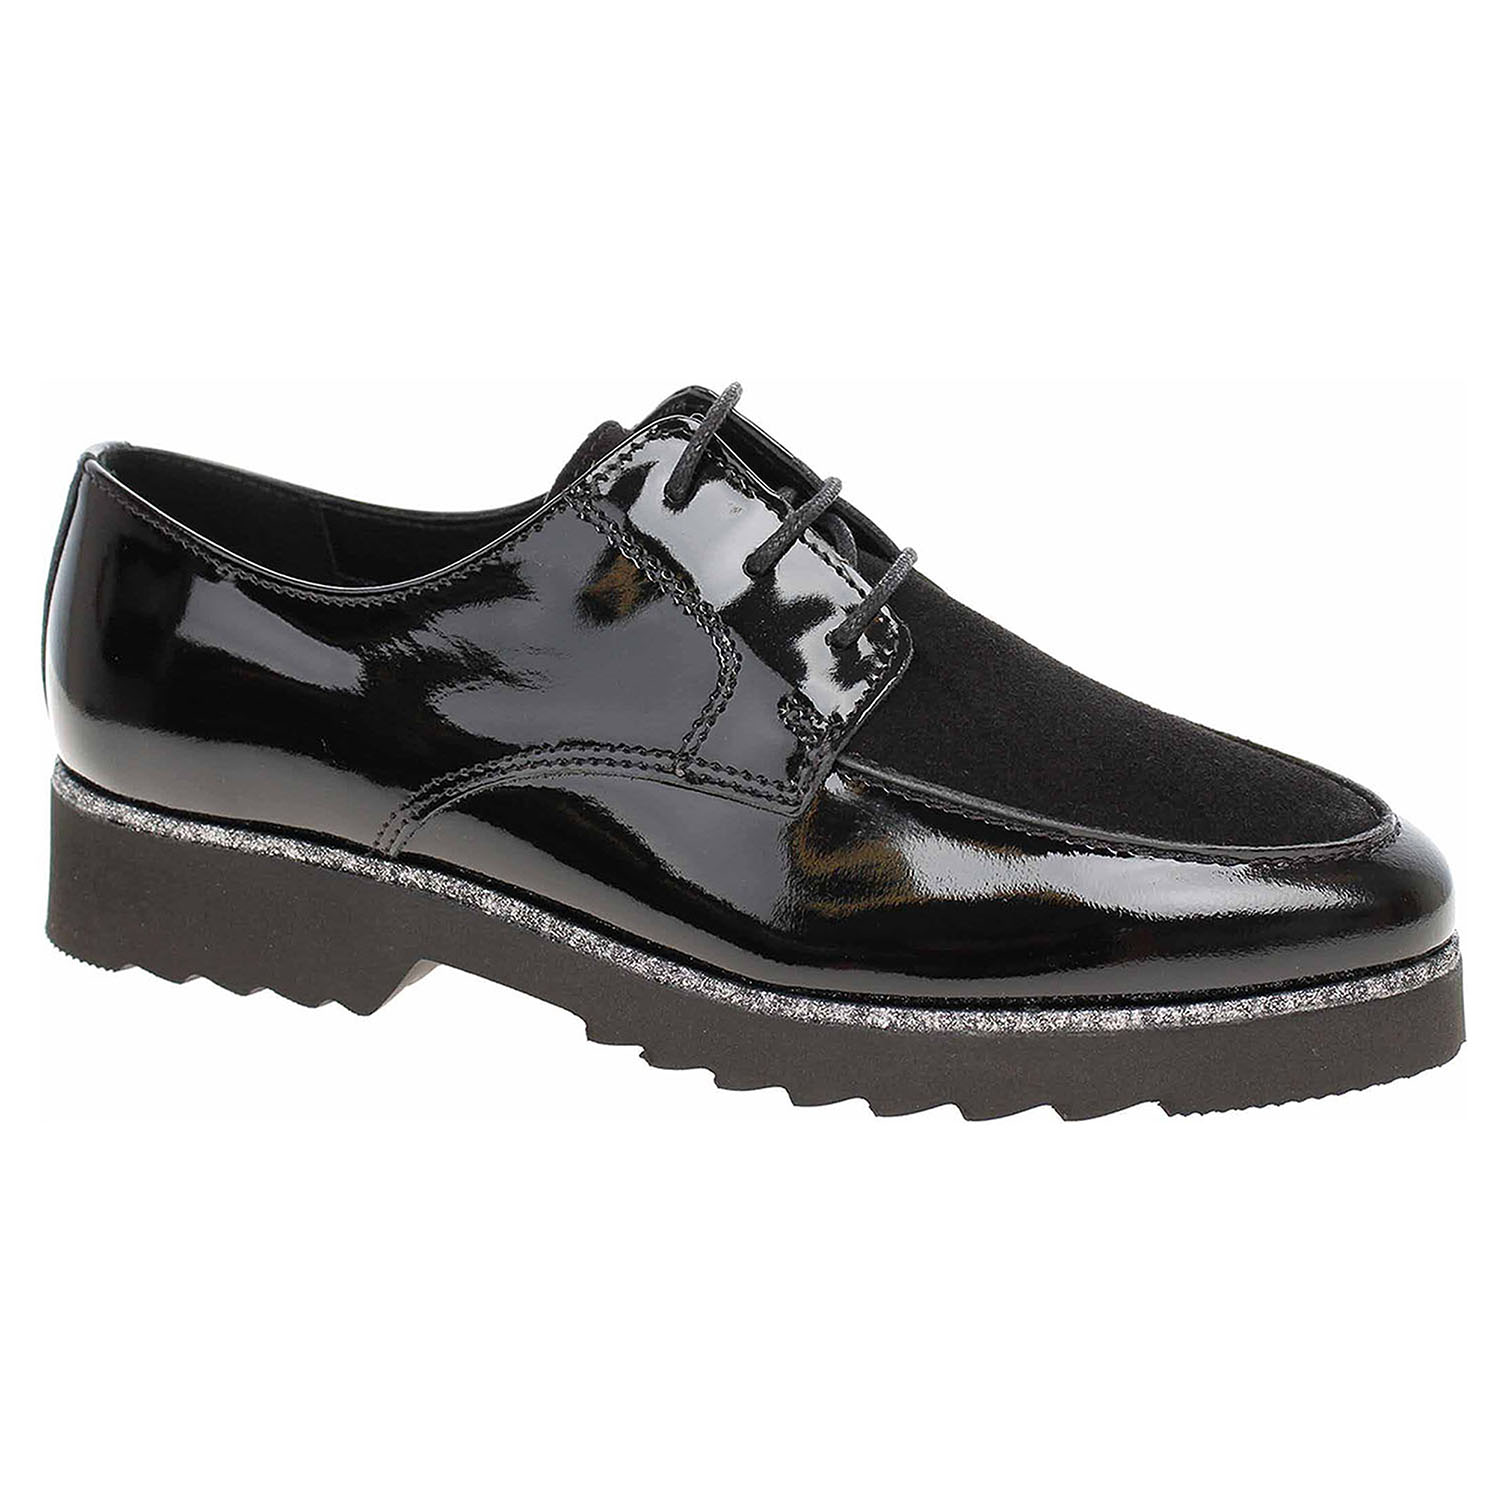 376cf7f6f2396 Dámske poltopánky Salamander 32-12503-61 black | REJNOK obuv